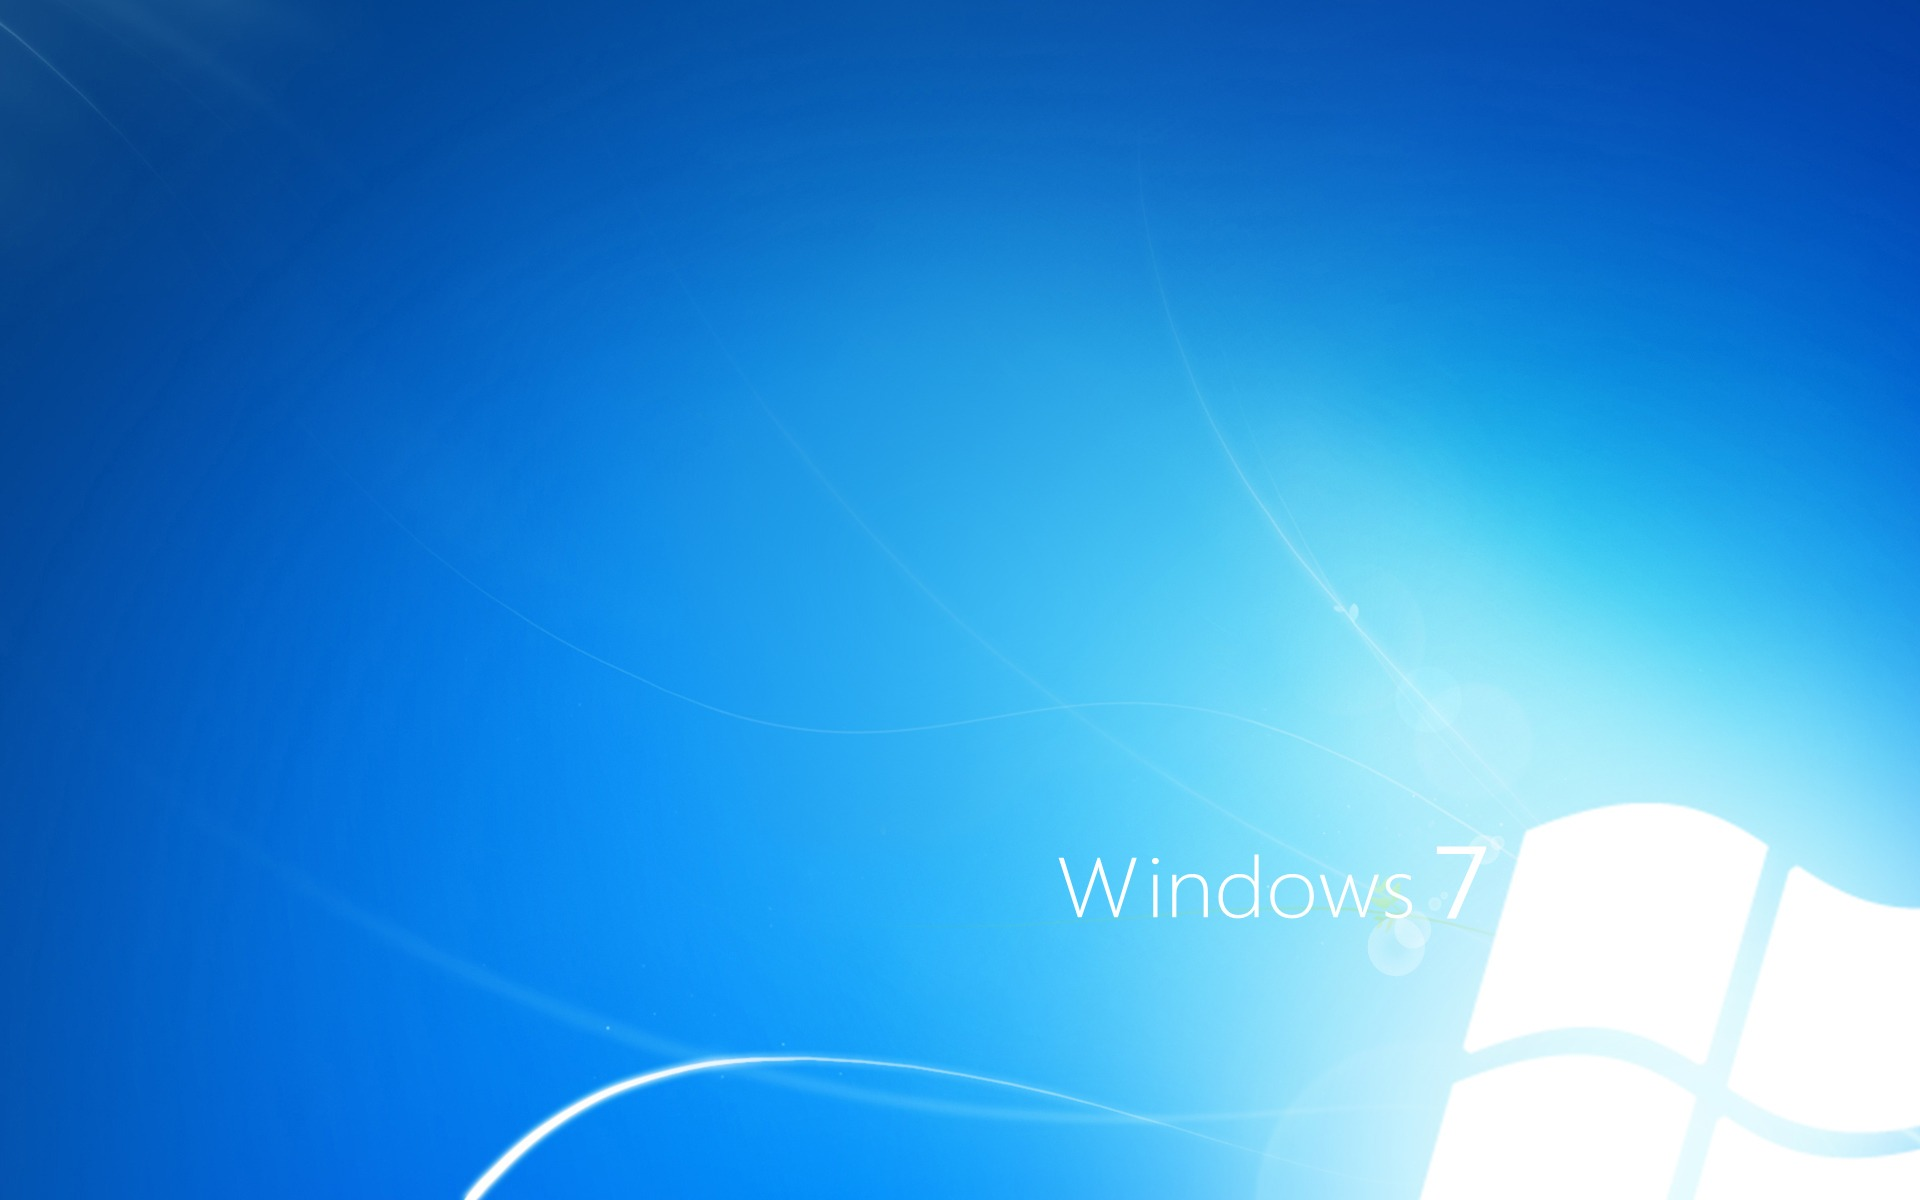 antique blue windows: windows 7 wallpaper blue news and